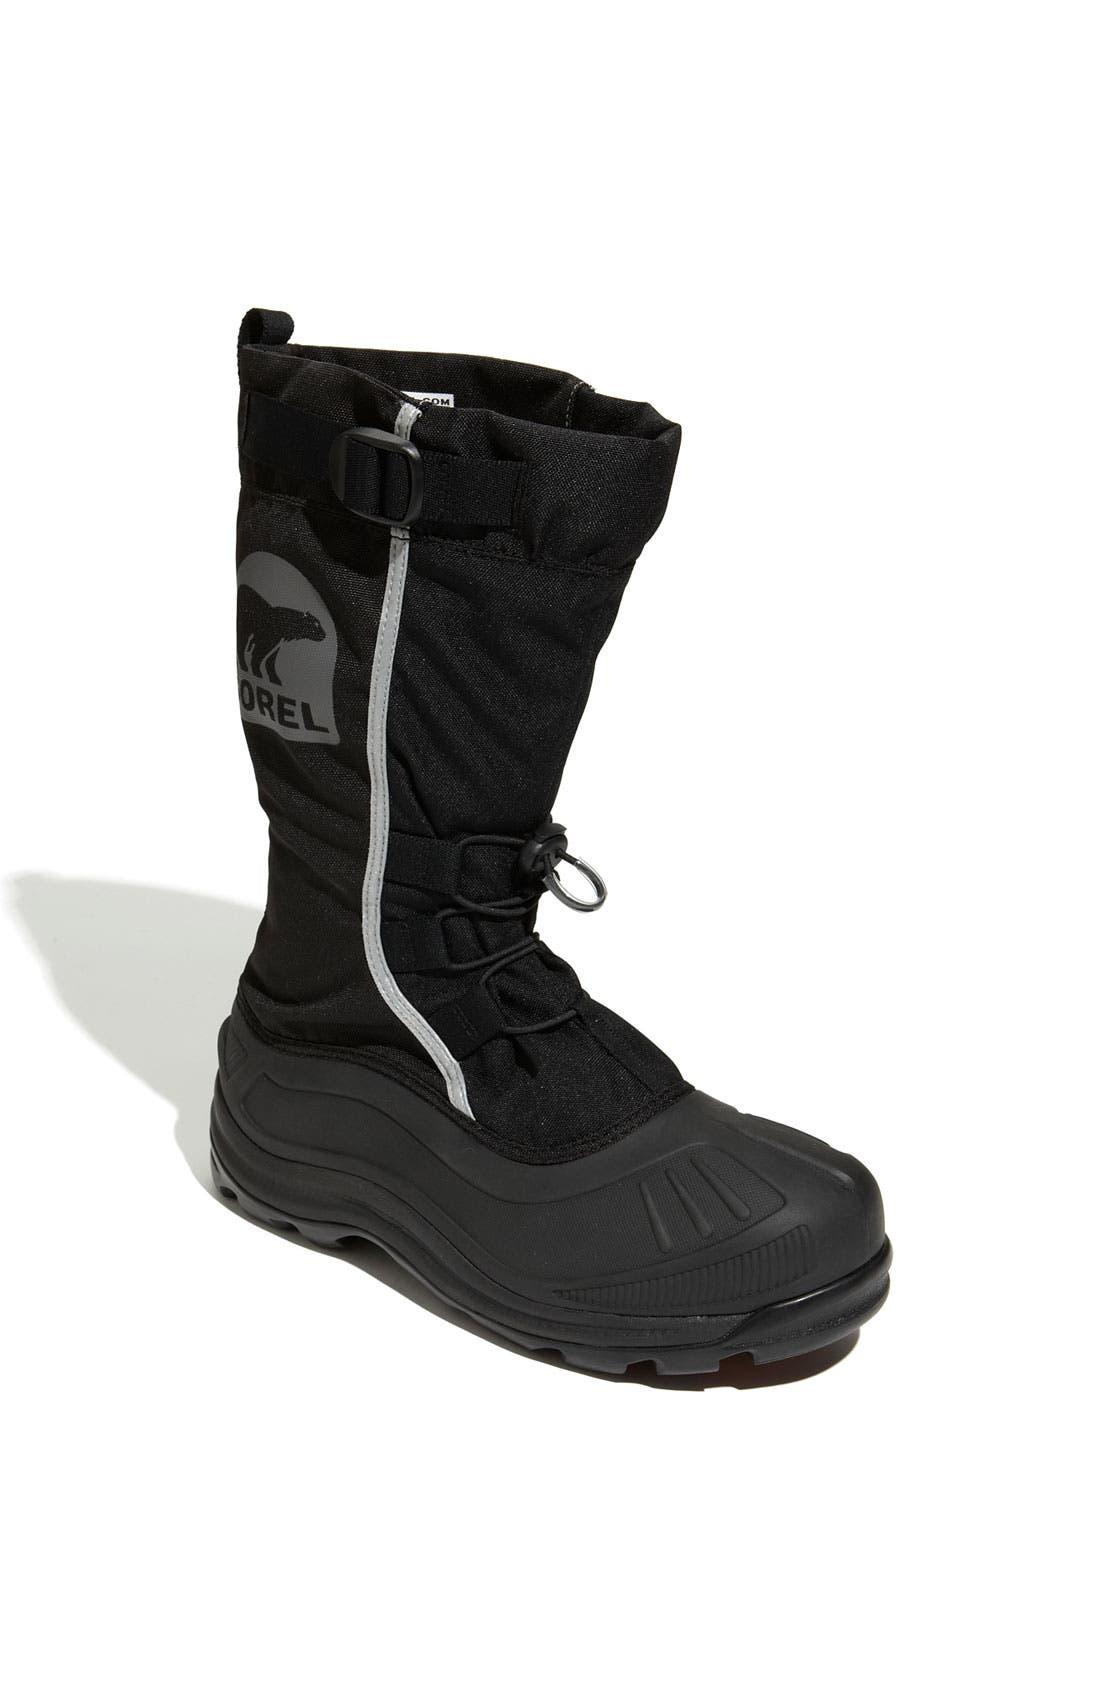 Alternate Image 1 Selected - Sorel 'Alpha PAC™' Boot